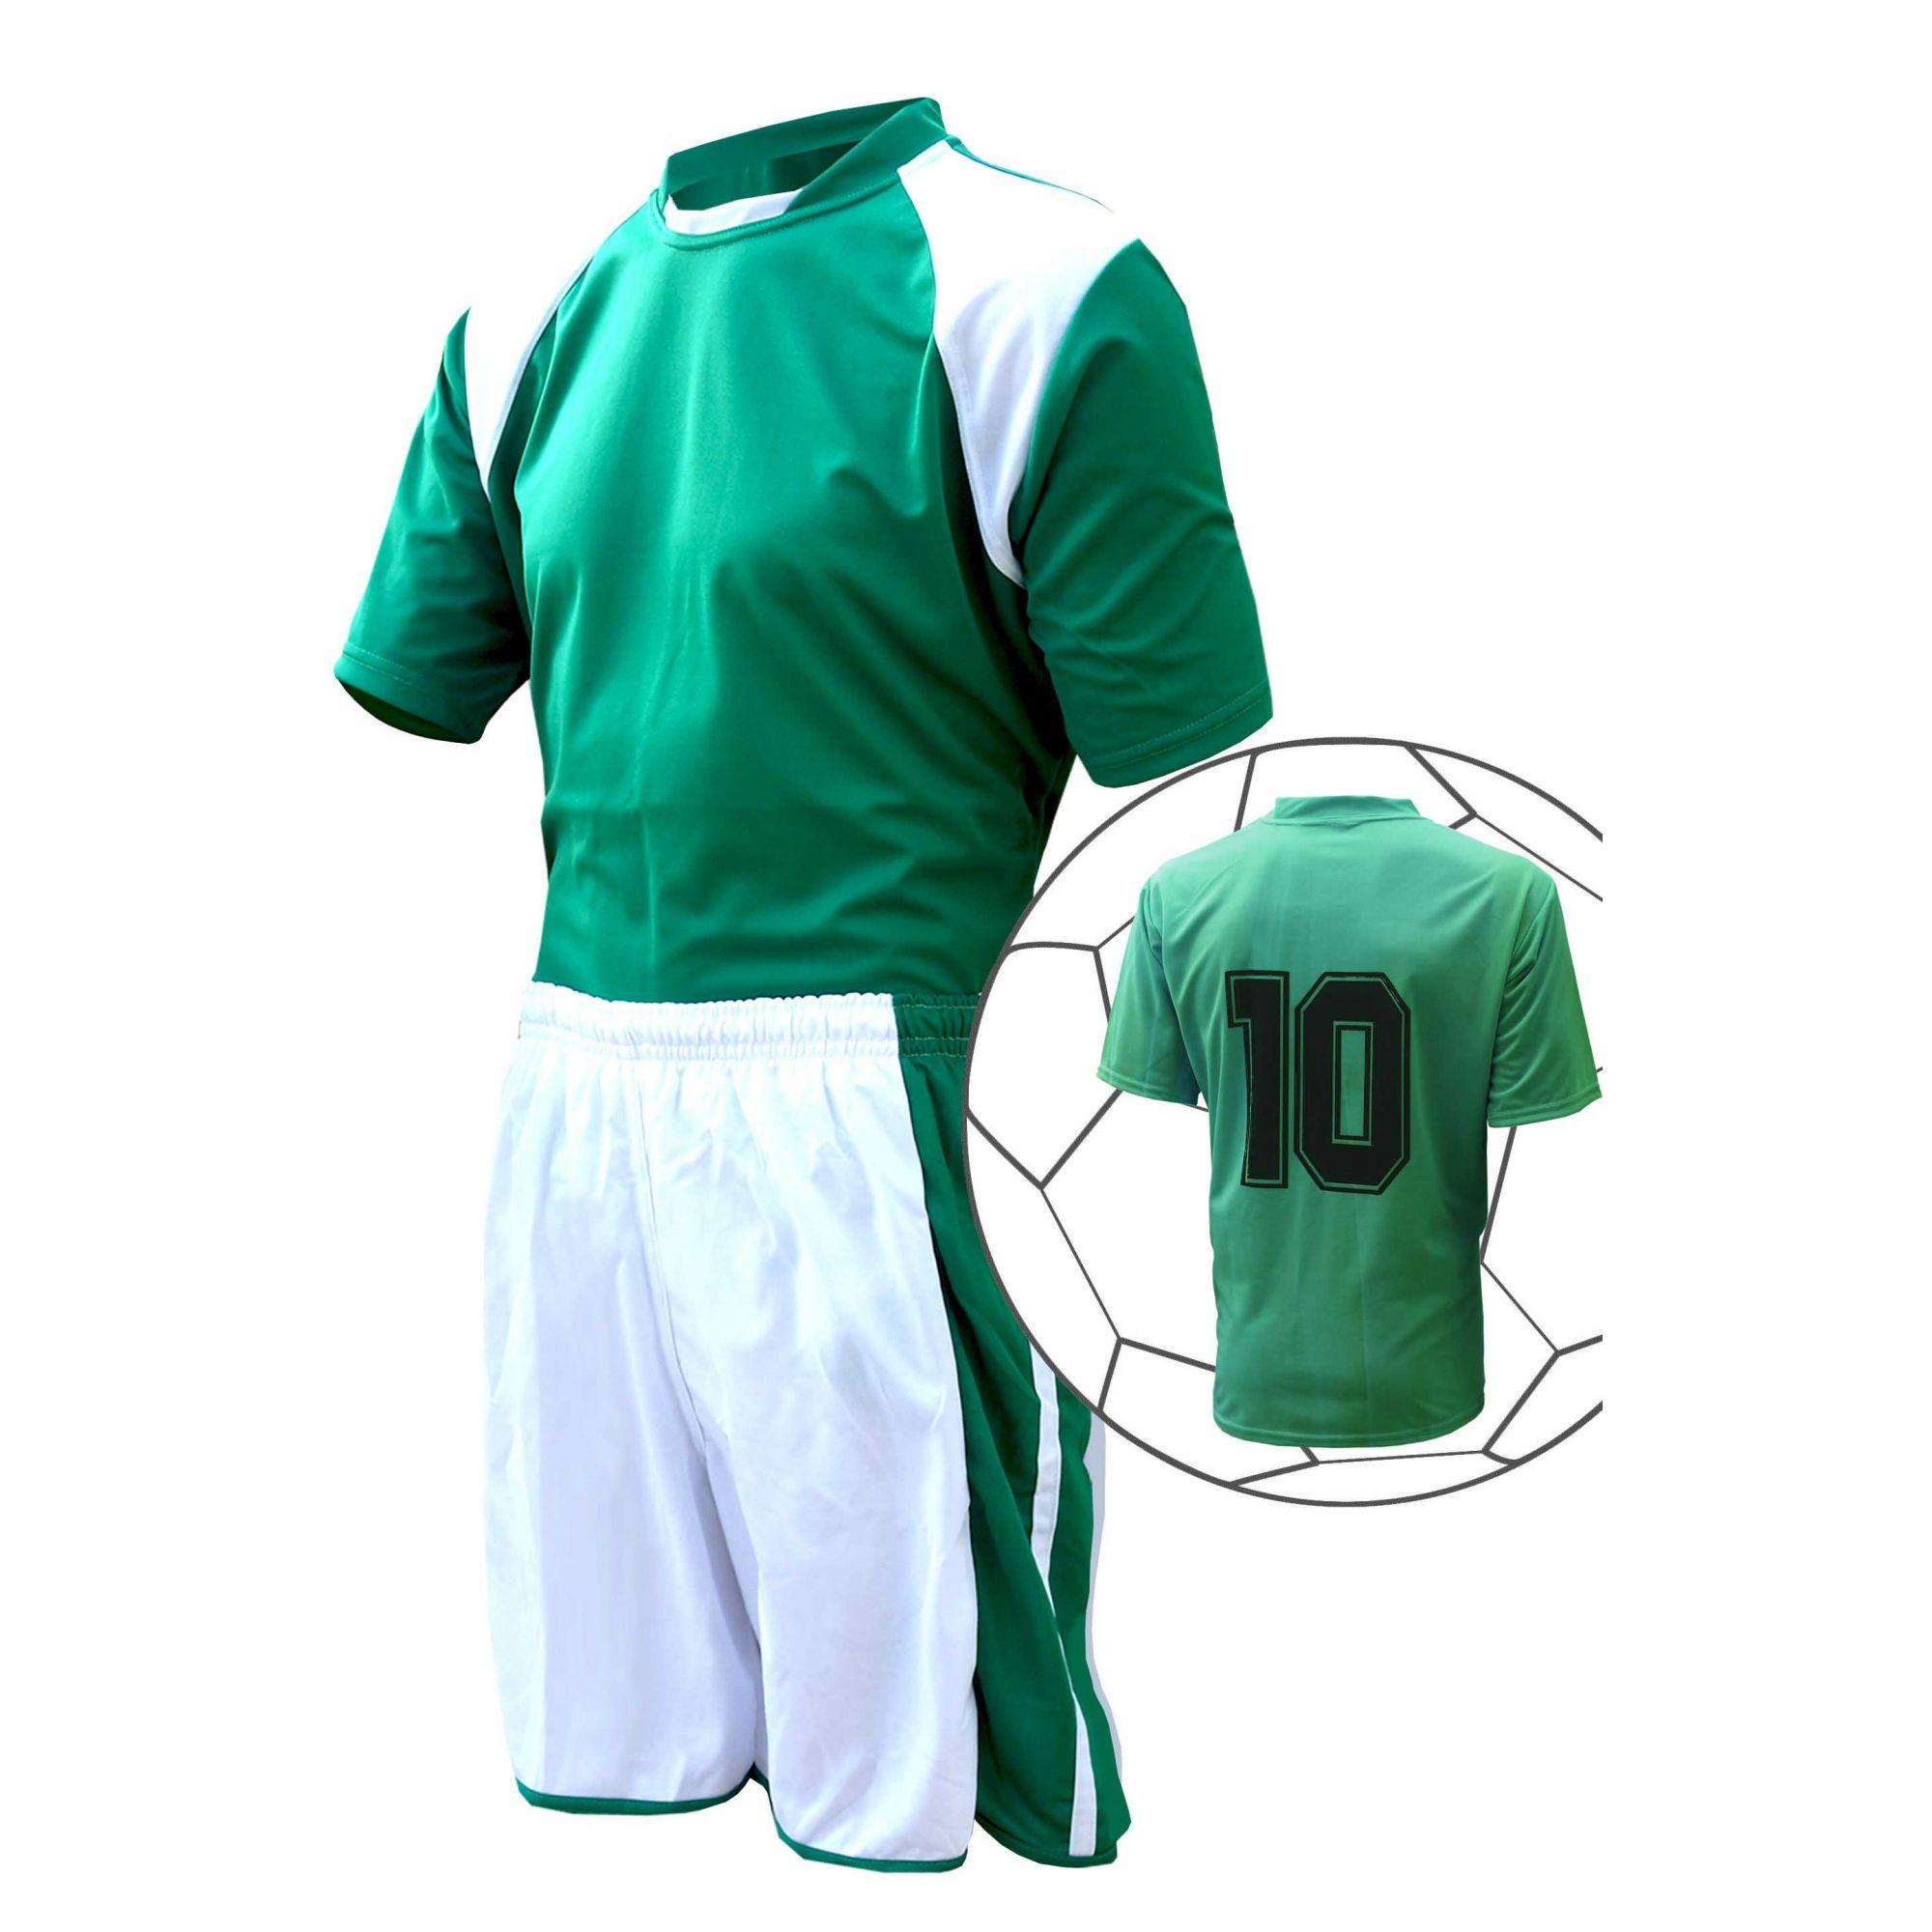 Uniforme de Futebol 10 + 1 Avante Ligth